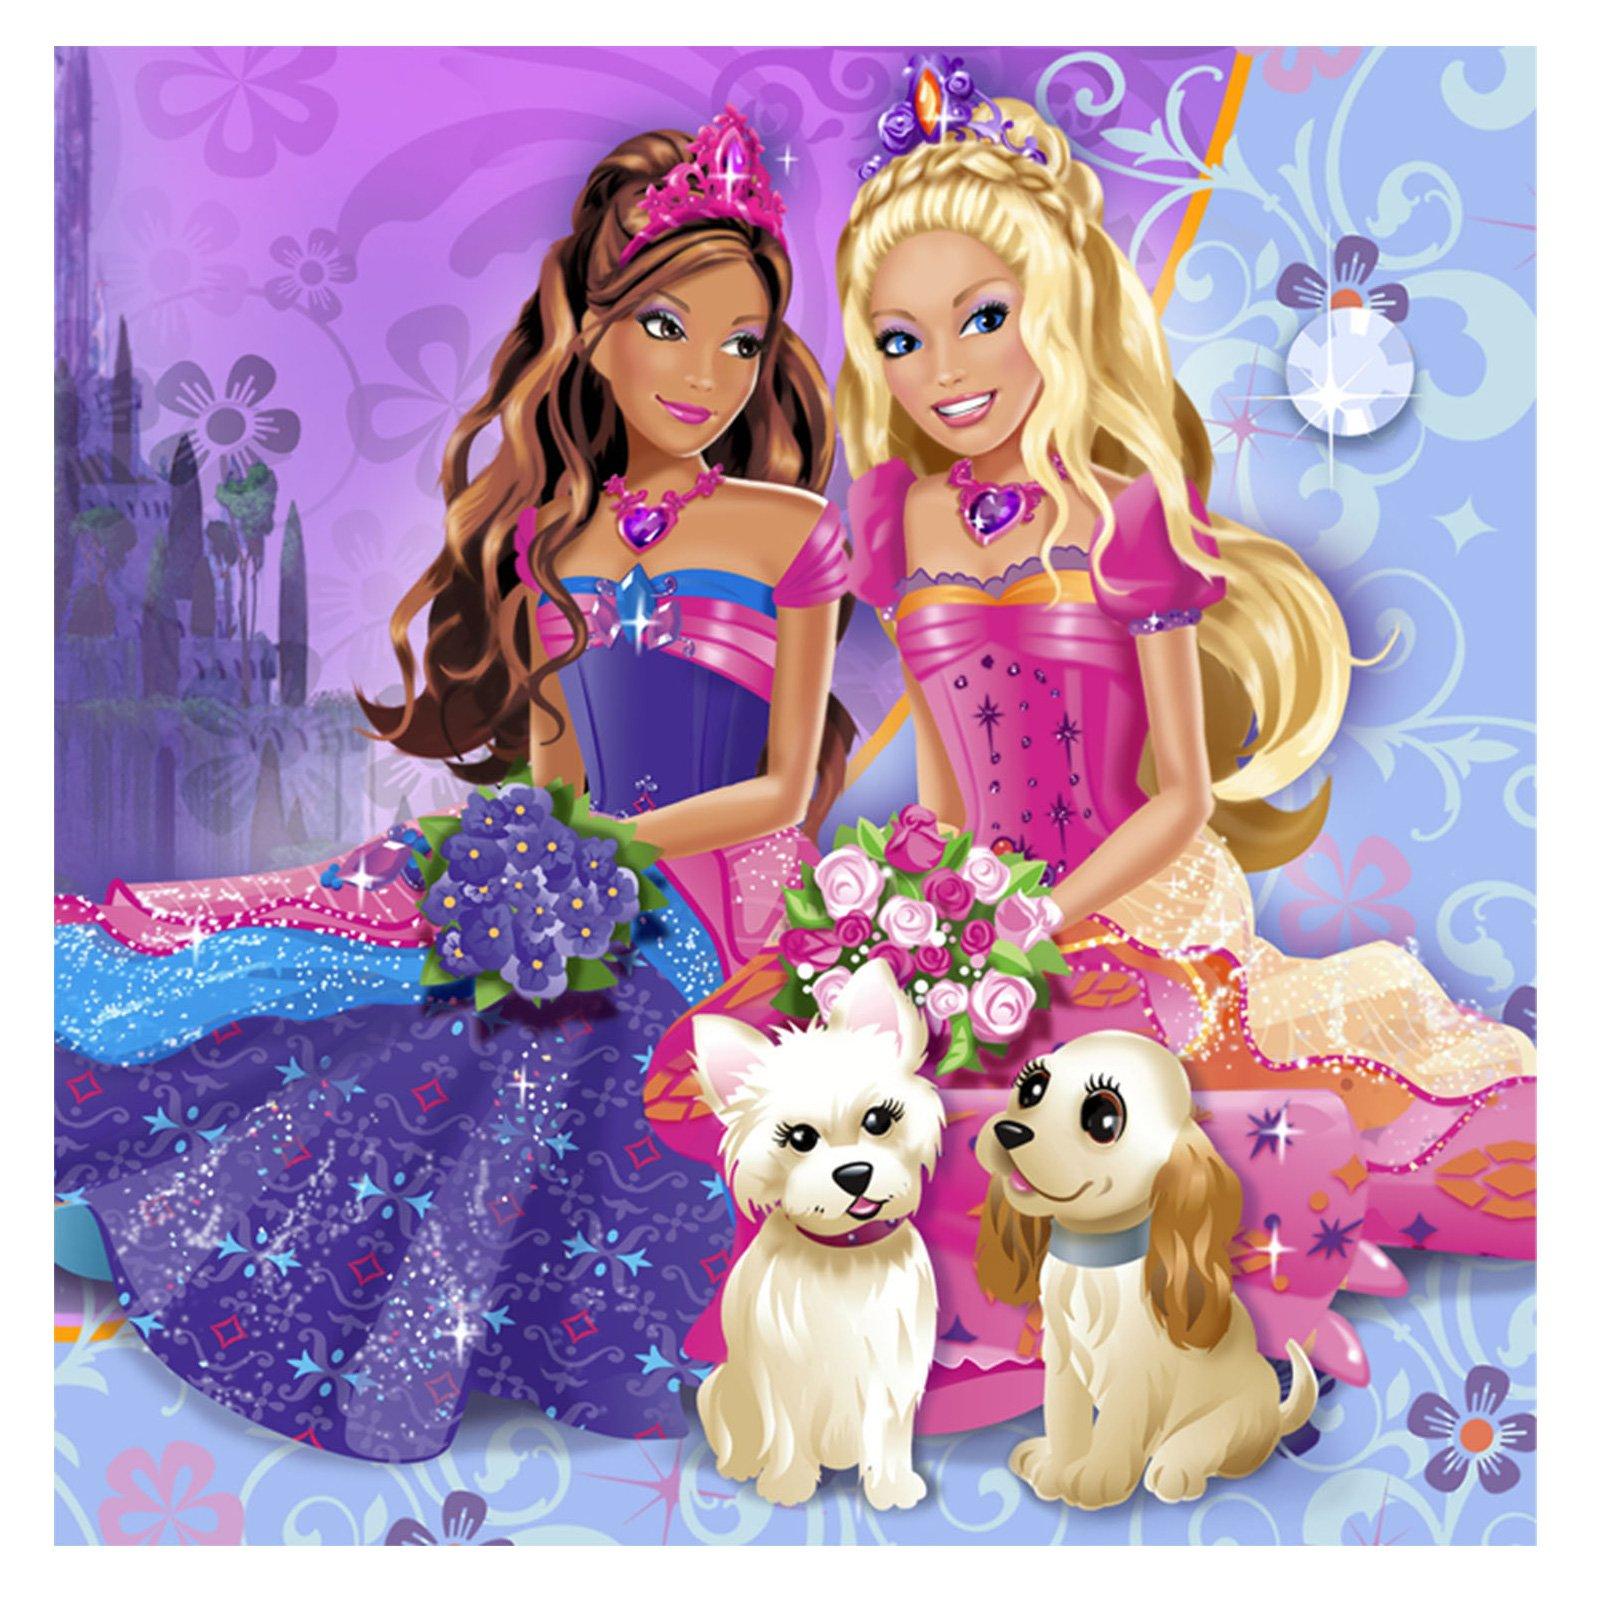 Cartoon Barbie Wallpaper